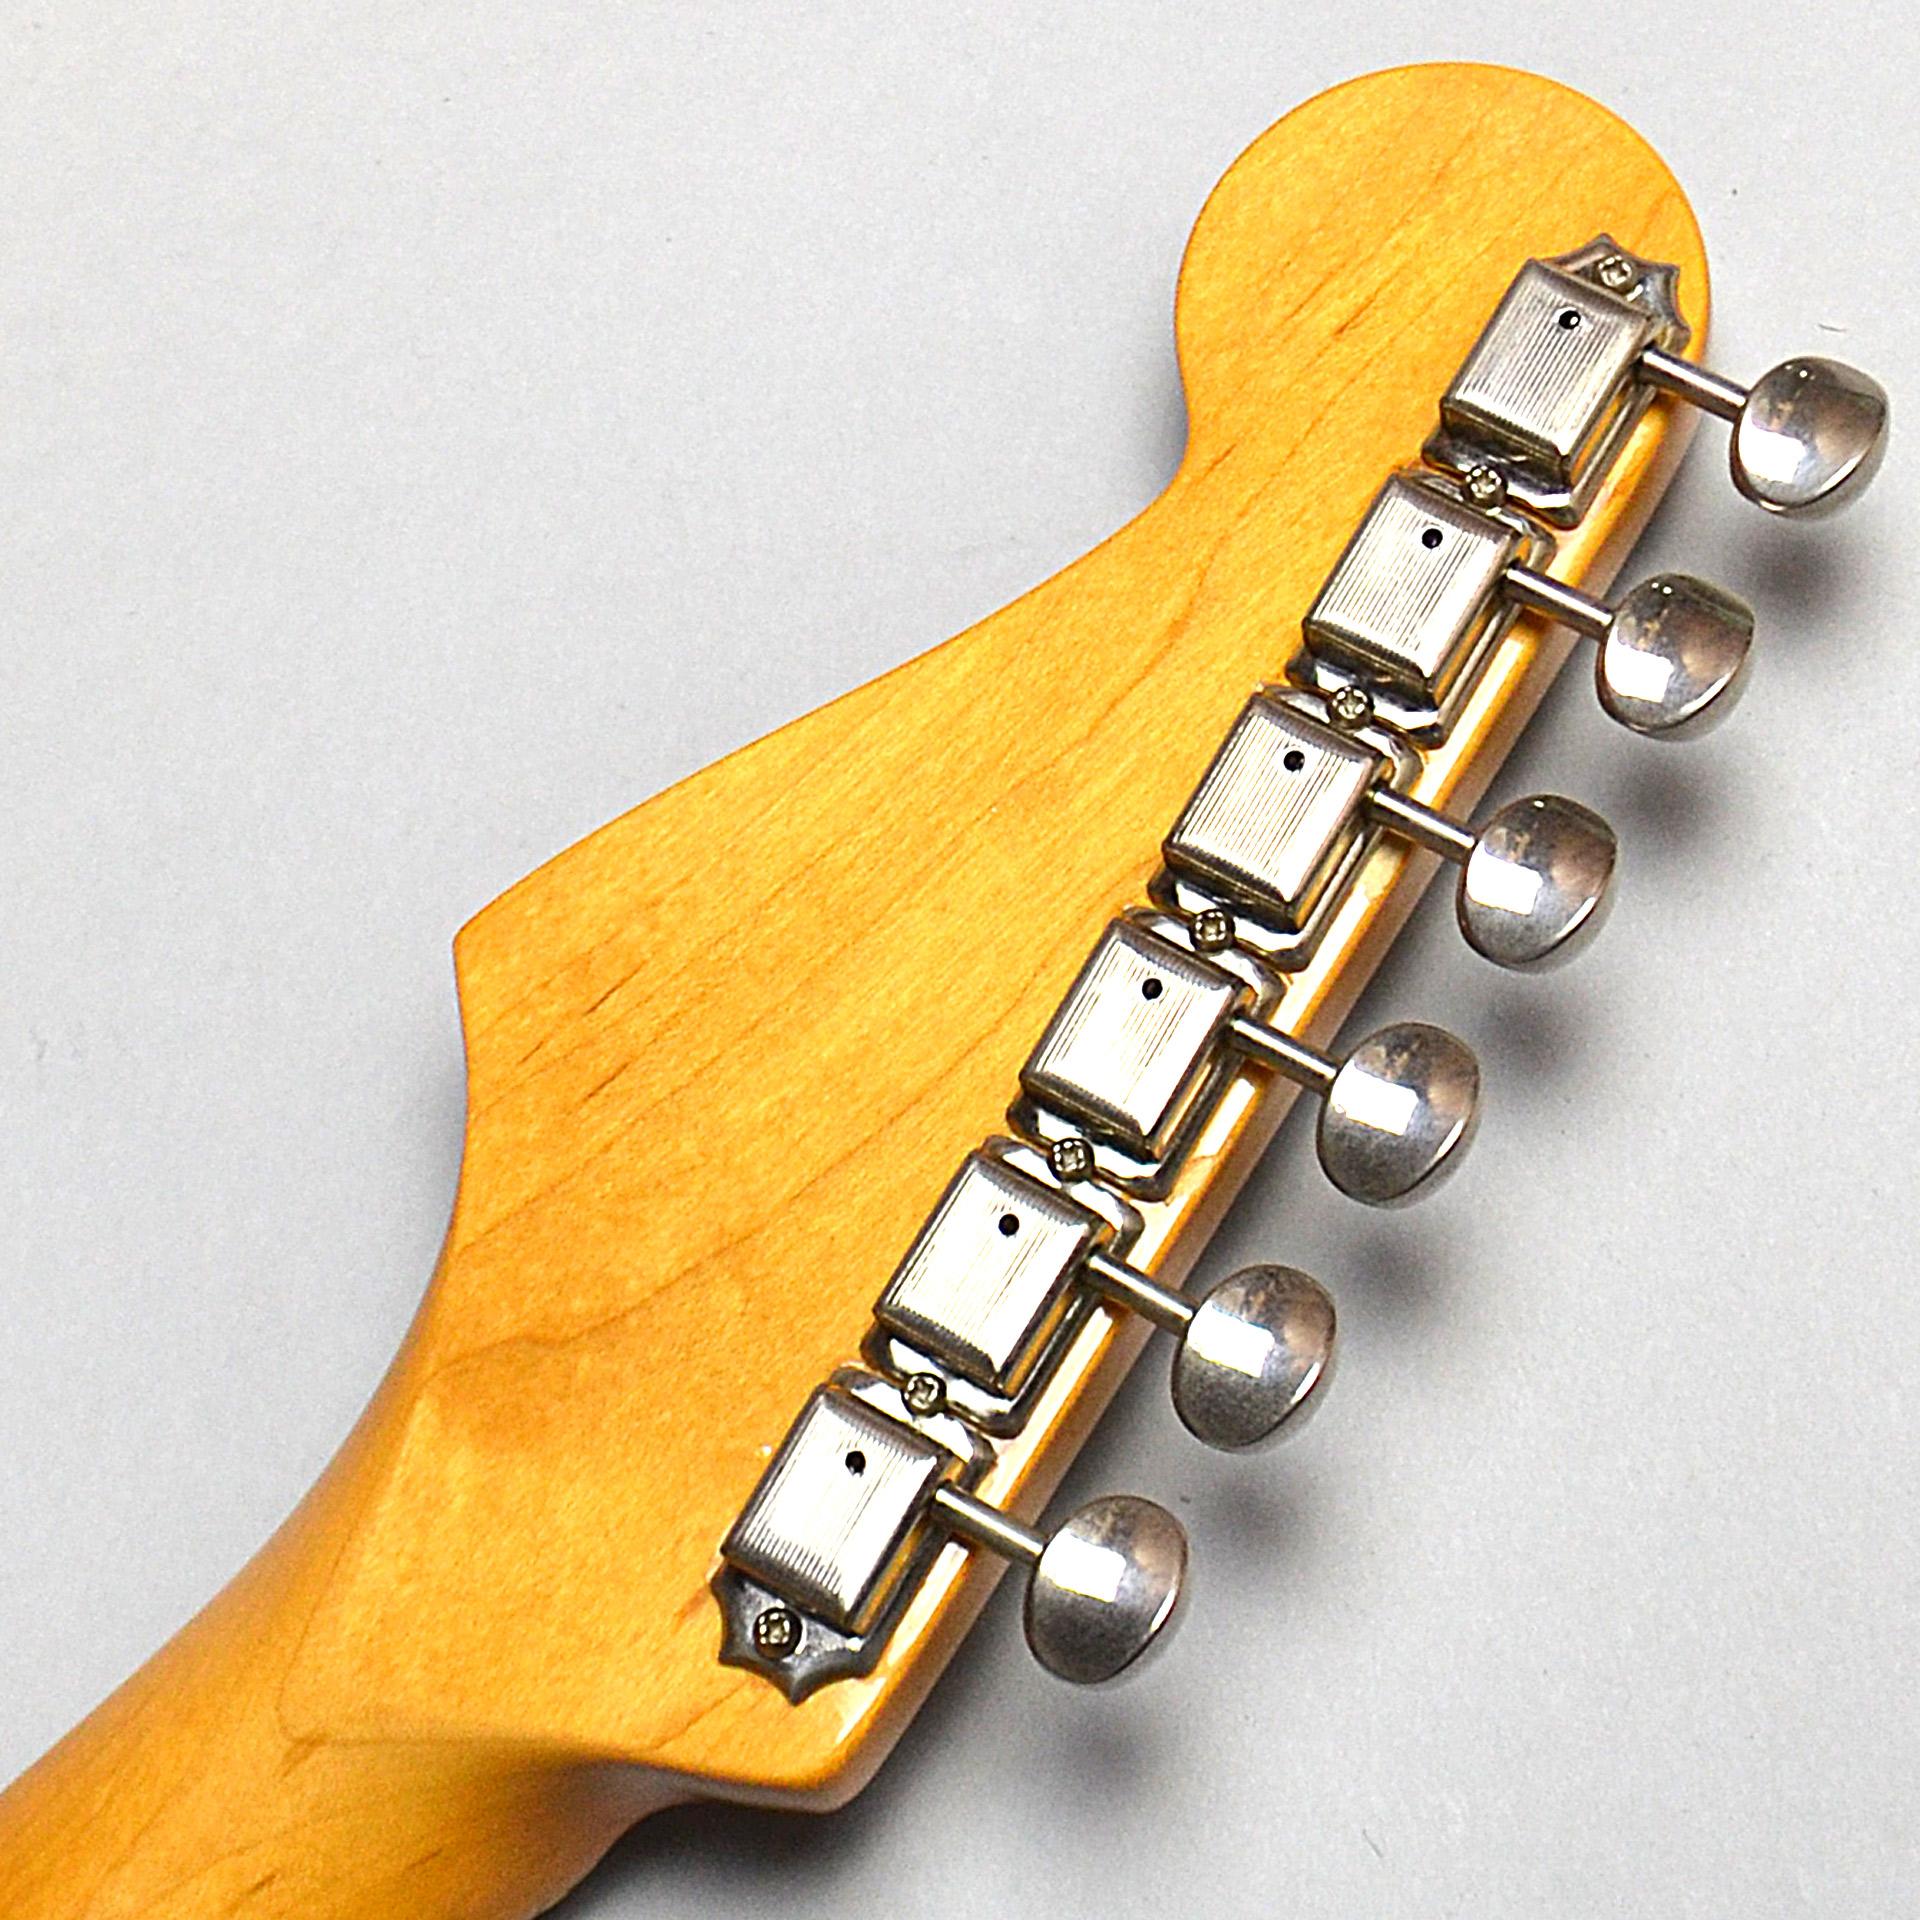 American Vintage '57 Stratocasterのヘッド裏-アップ画像